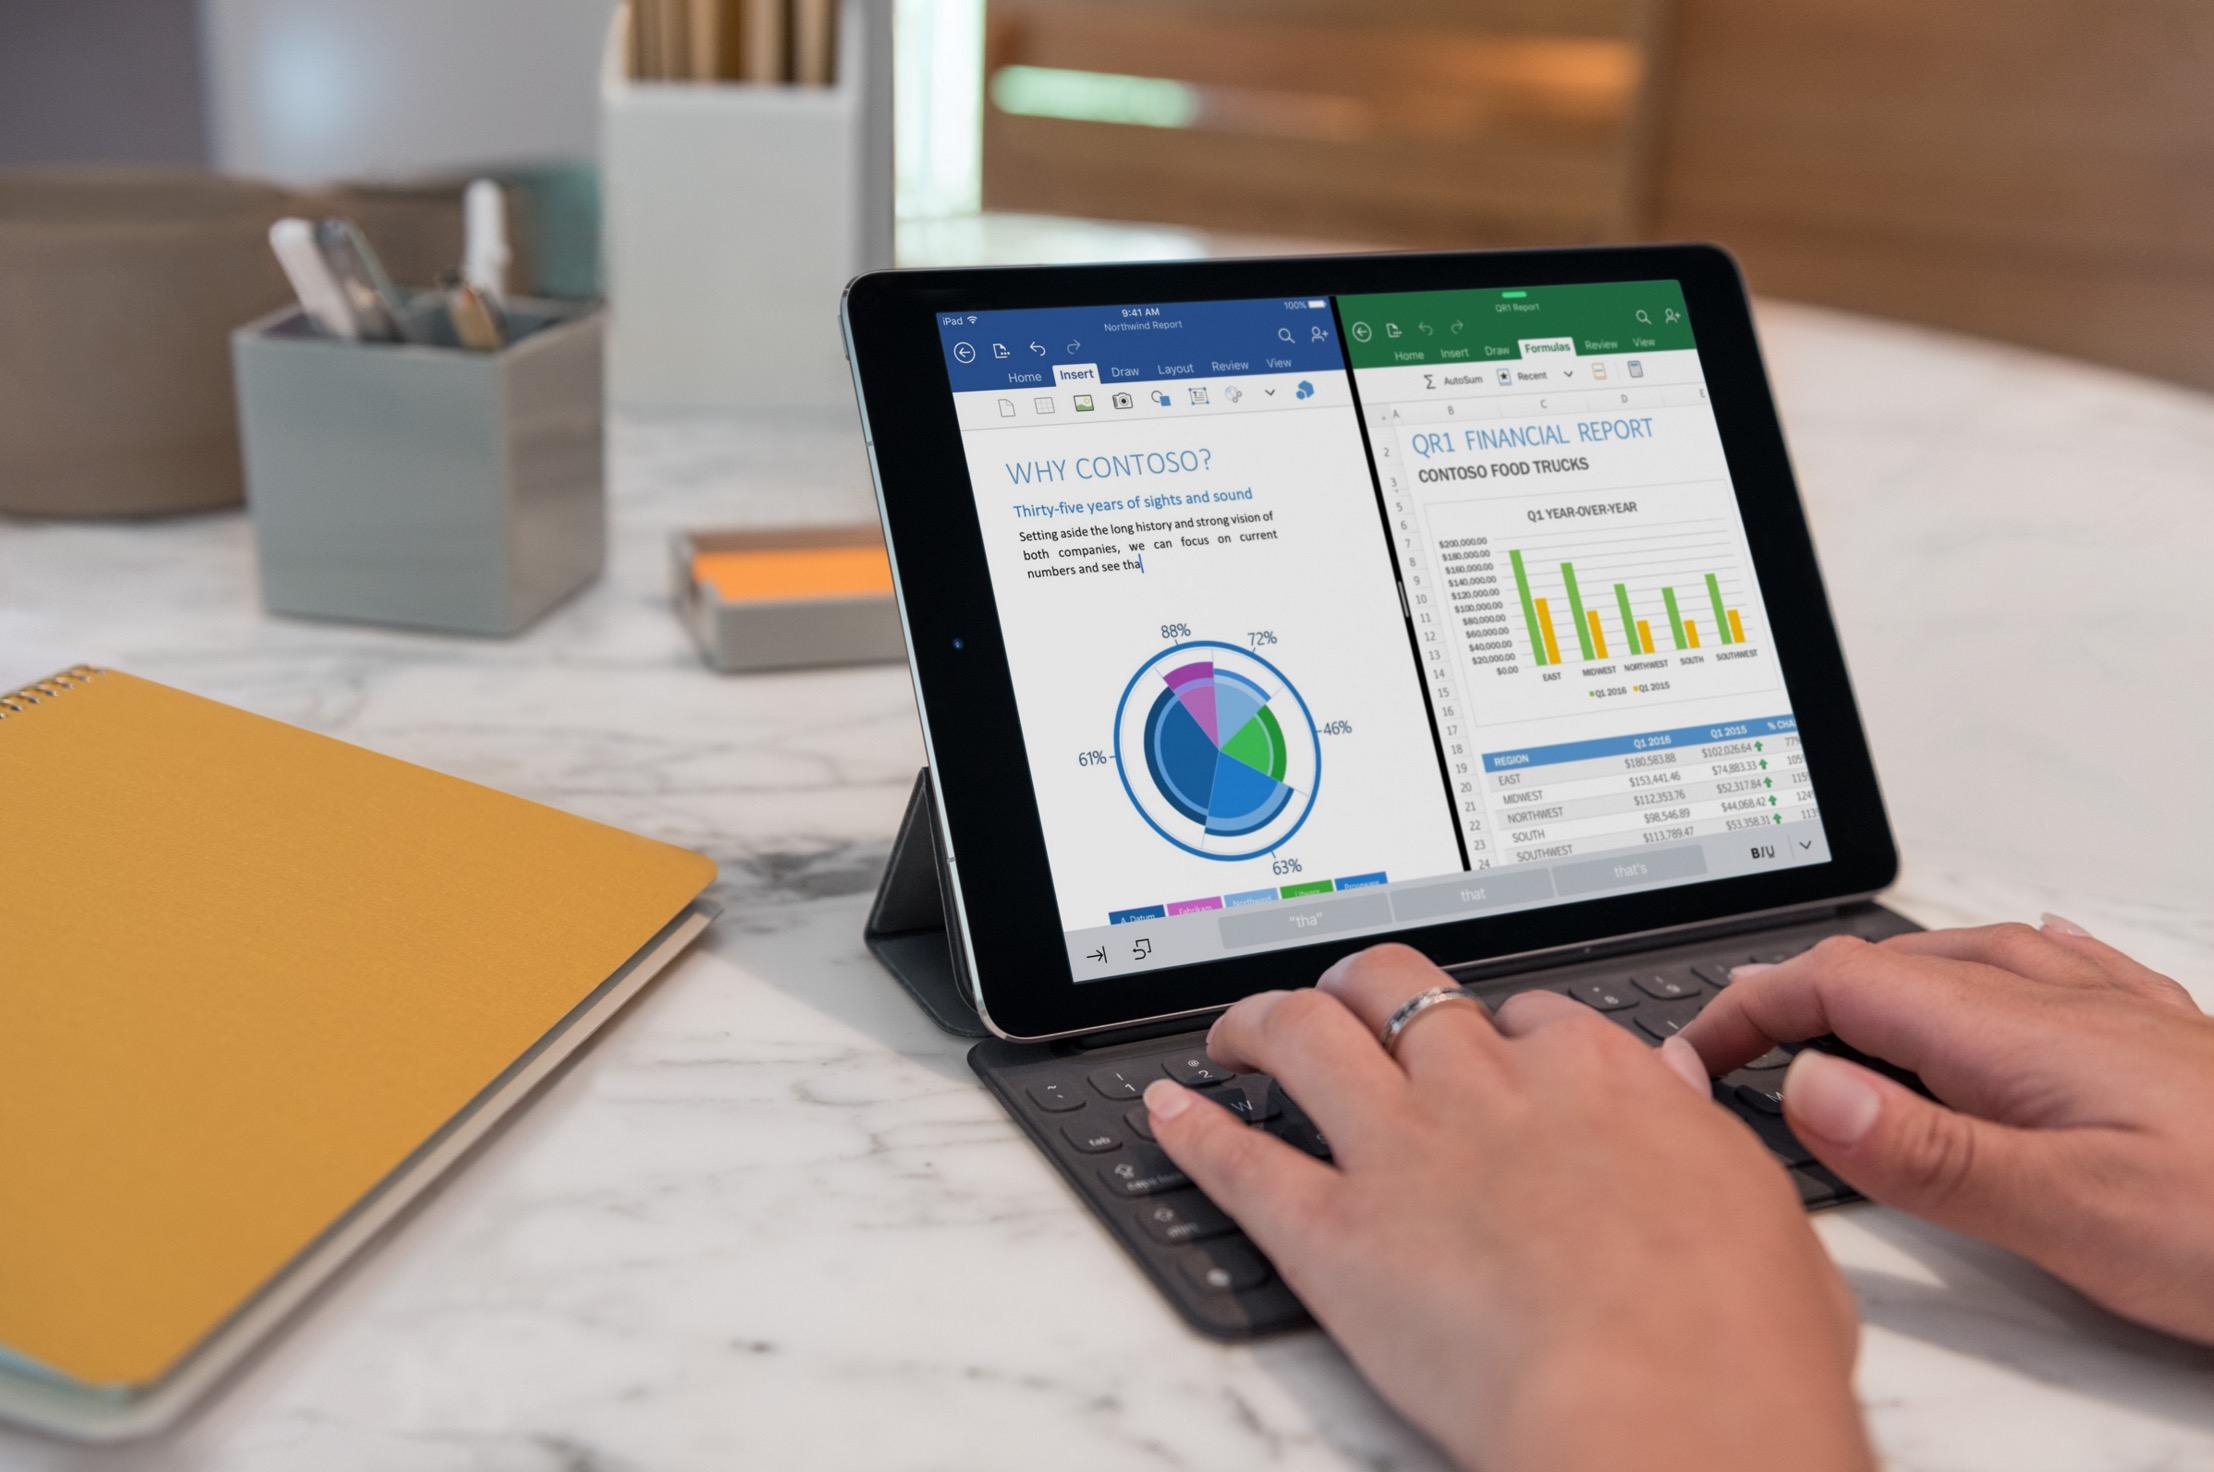 iPad Pro 9.7インチモデル